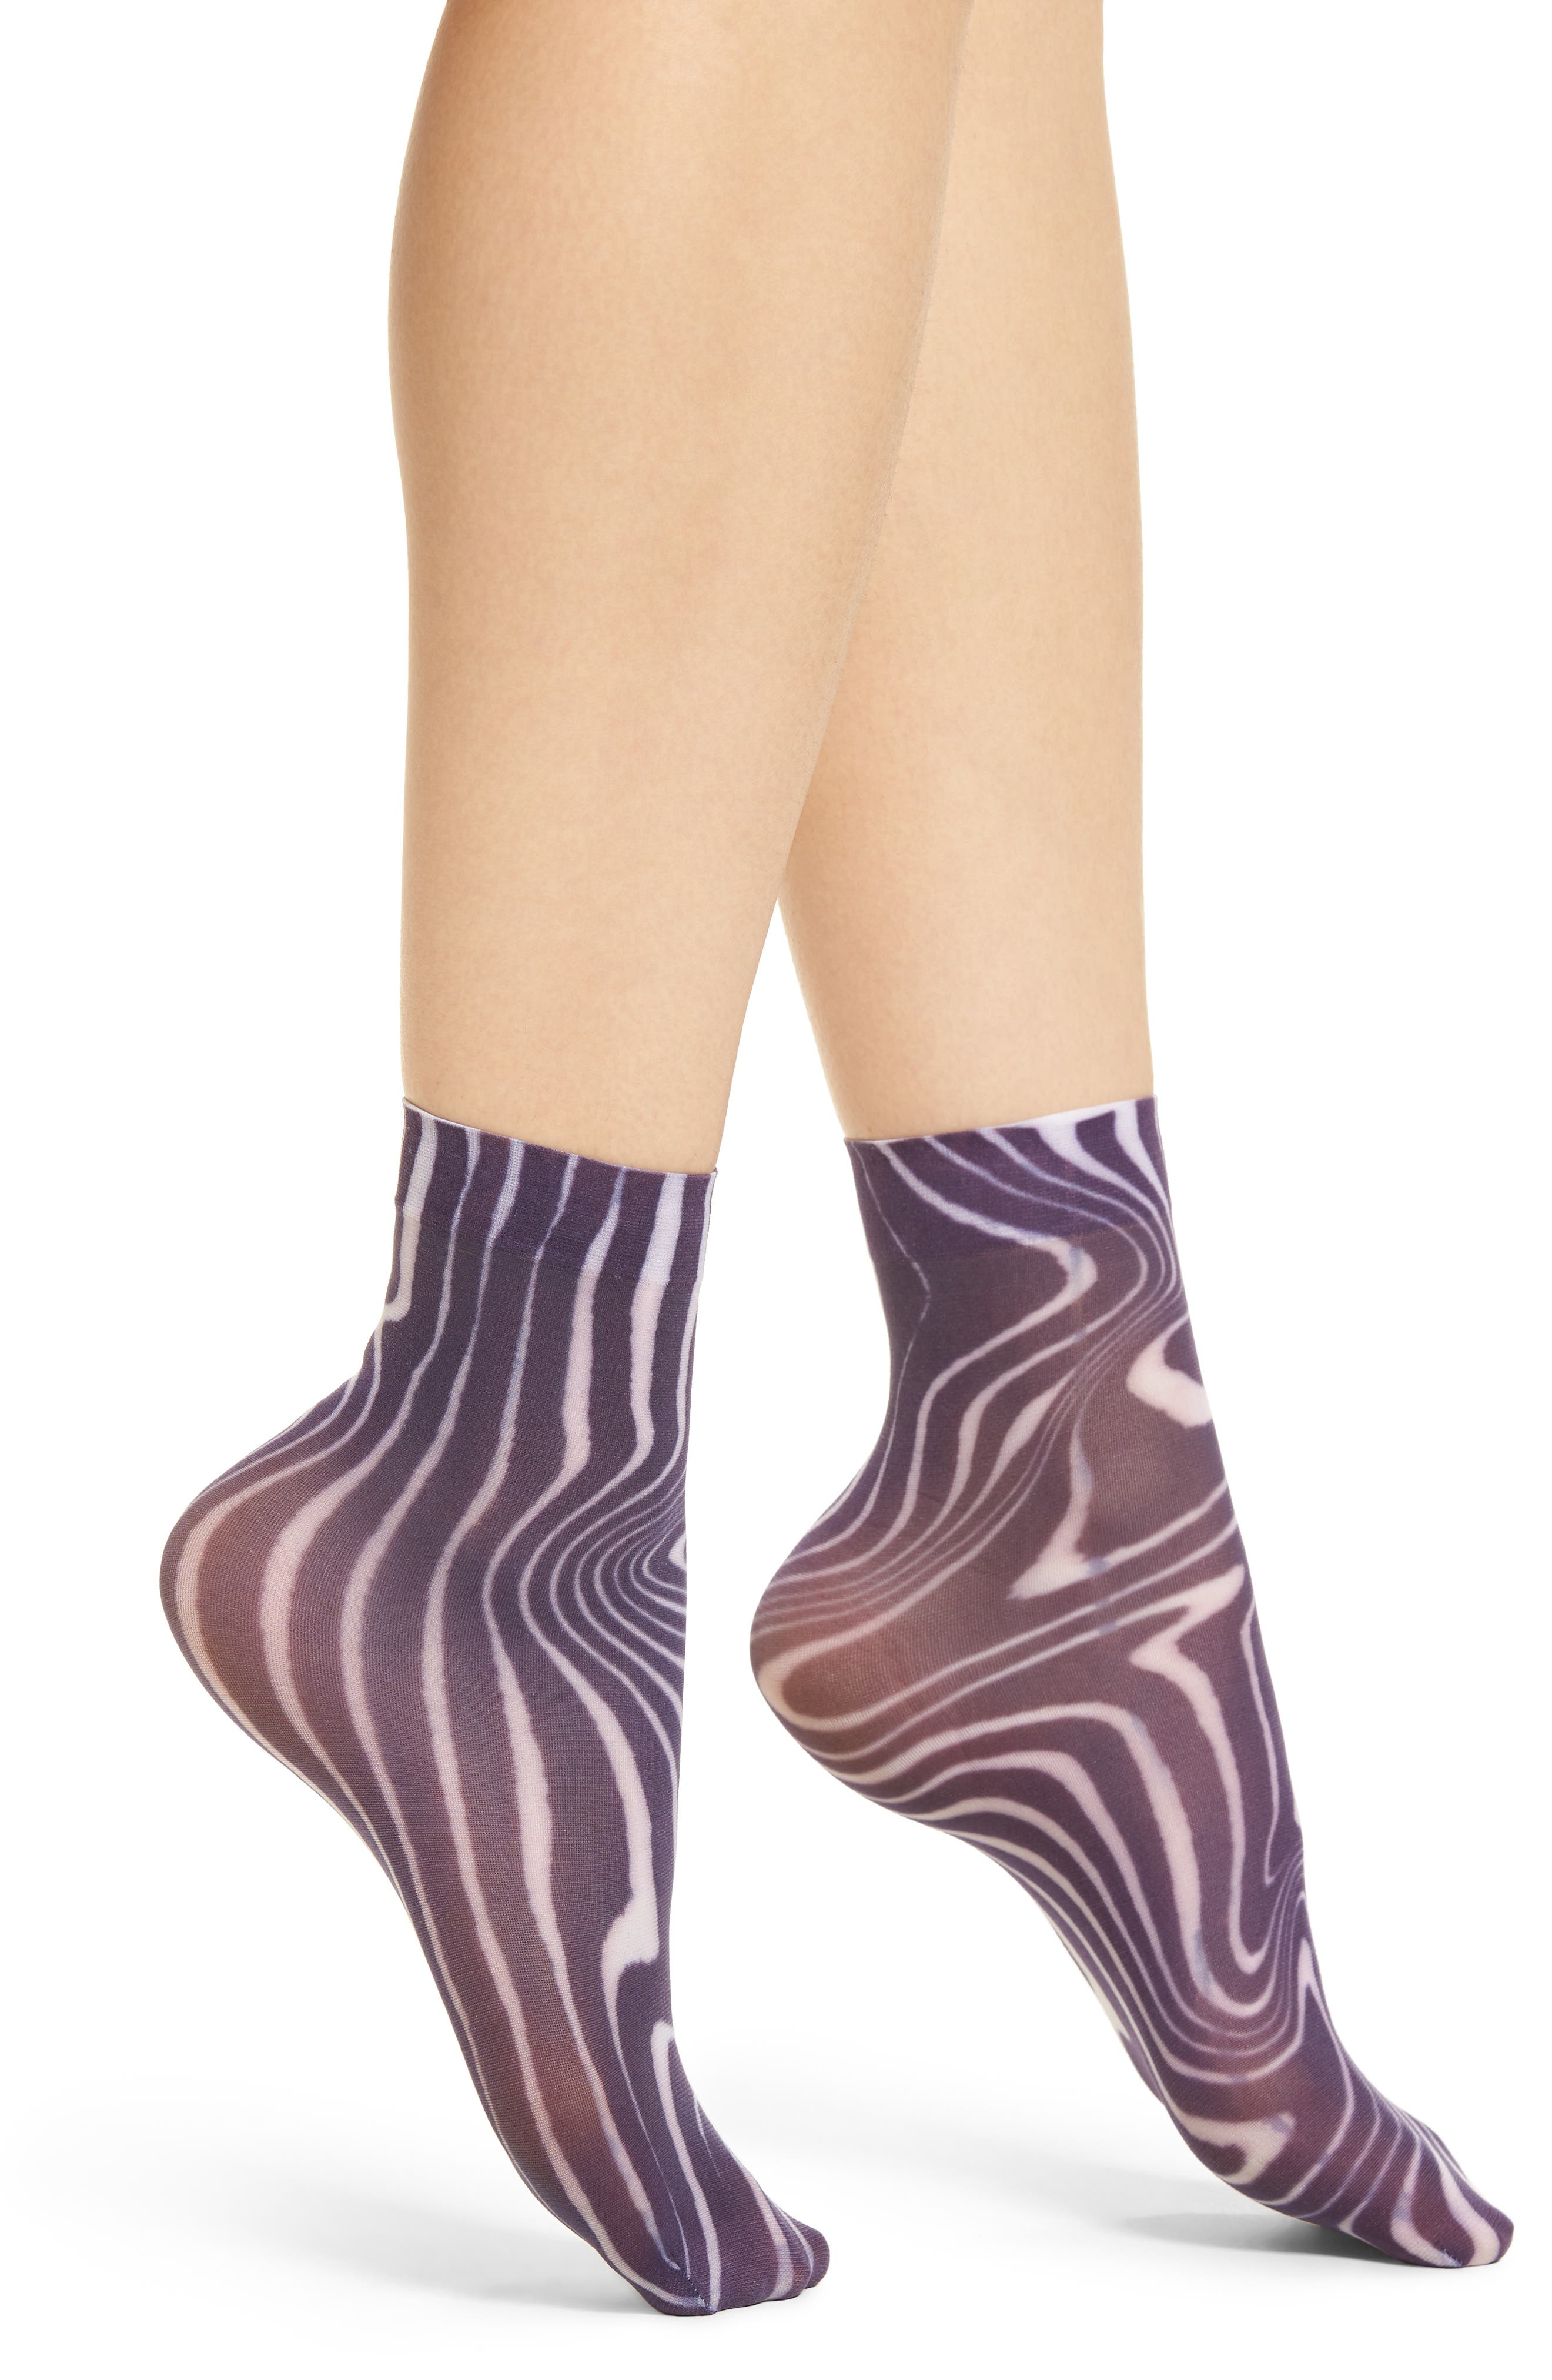 Mia Ankle Socks,                             Main thumbnail 1, color,                             009